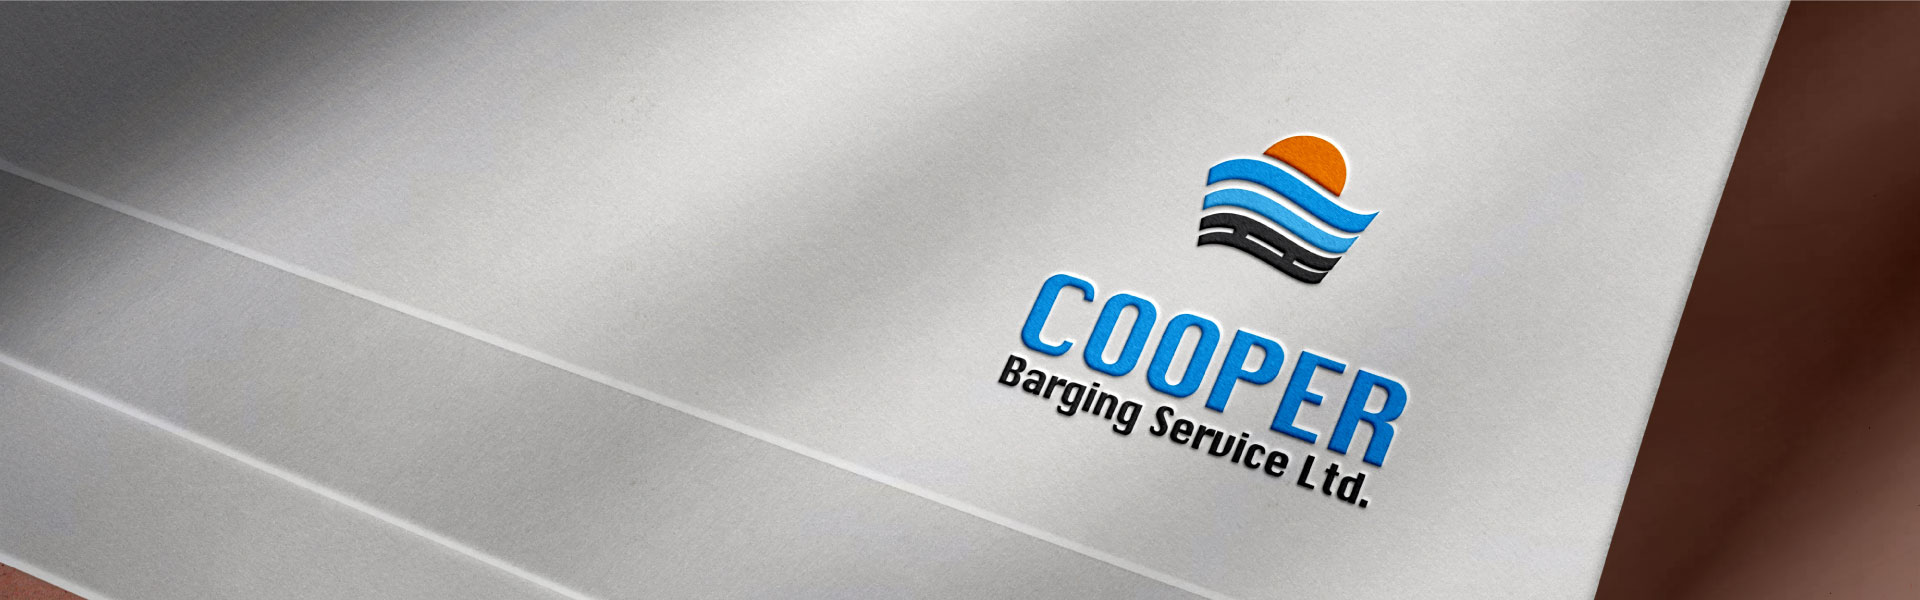 cooper-barging-service-brand-logo-design-by-mapleweb-vancouver-canada-paper-mock